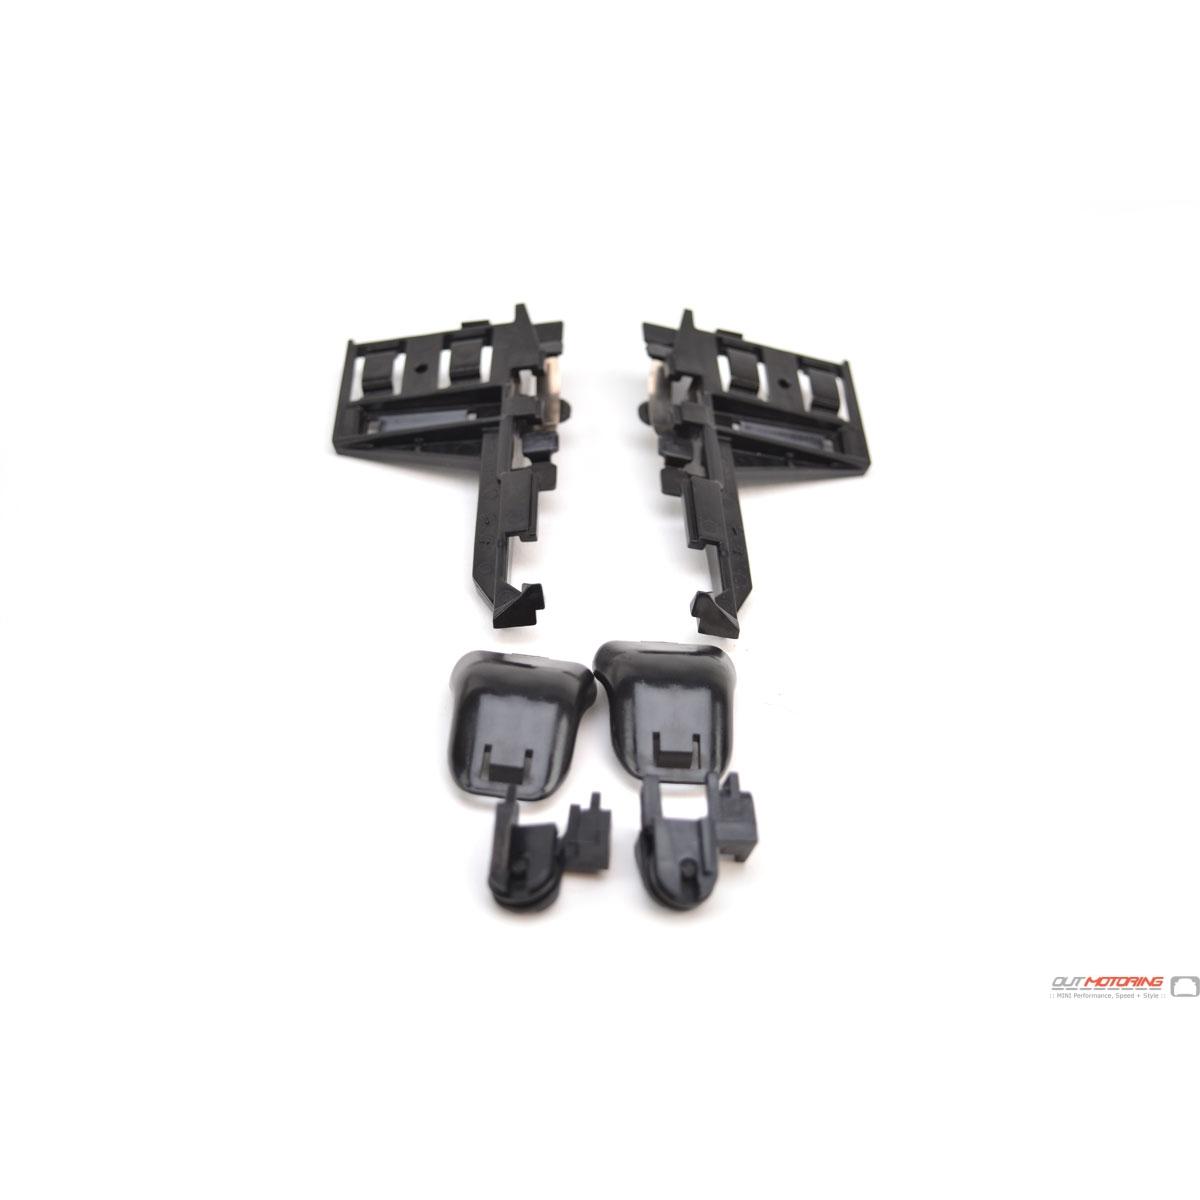 54107379625 MINI Cooper Replacement Sunroof Roller